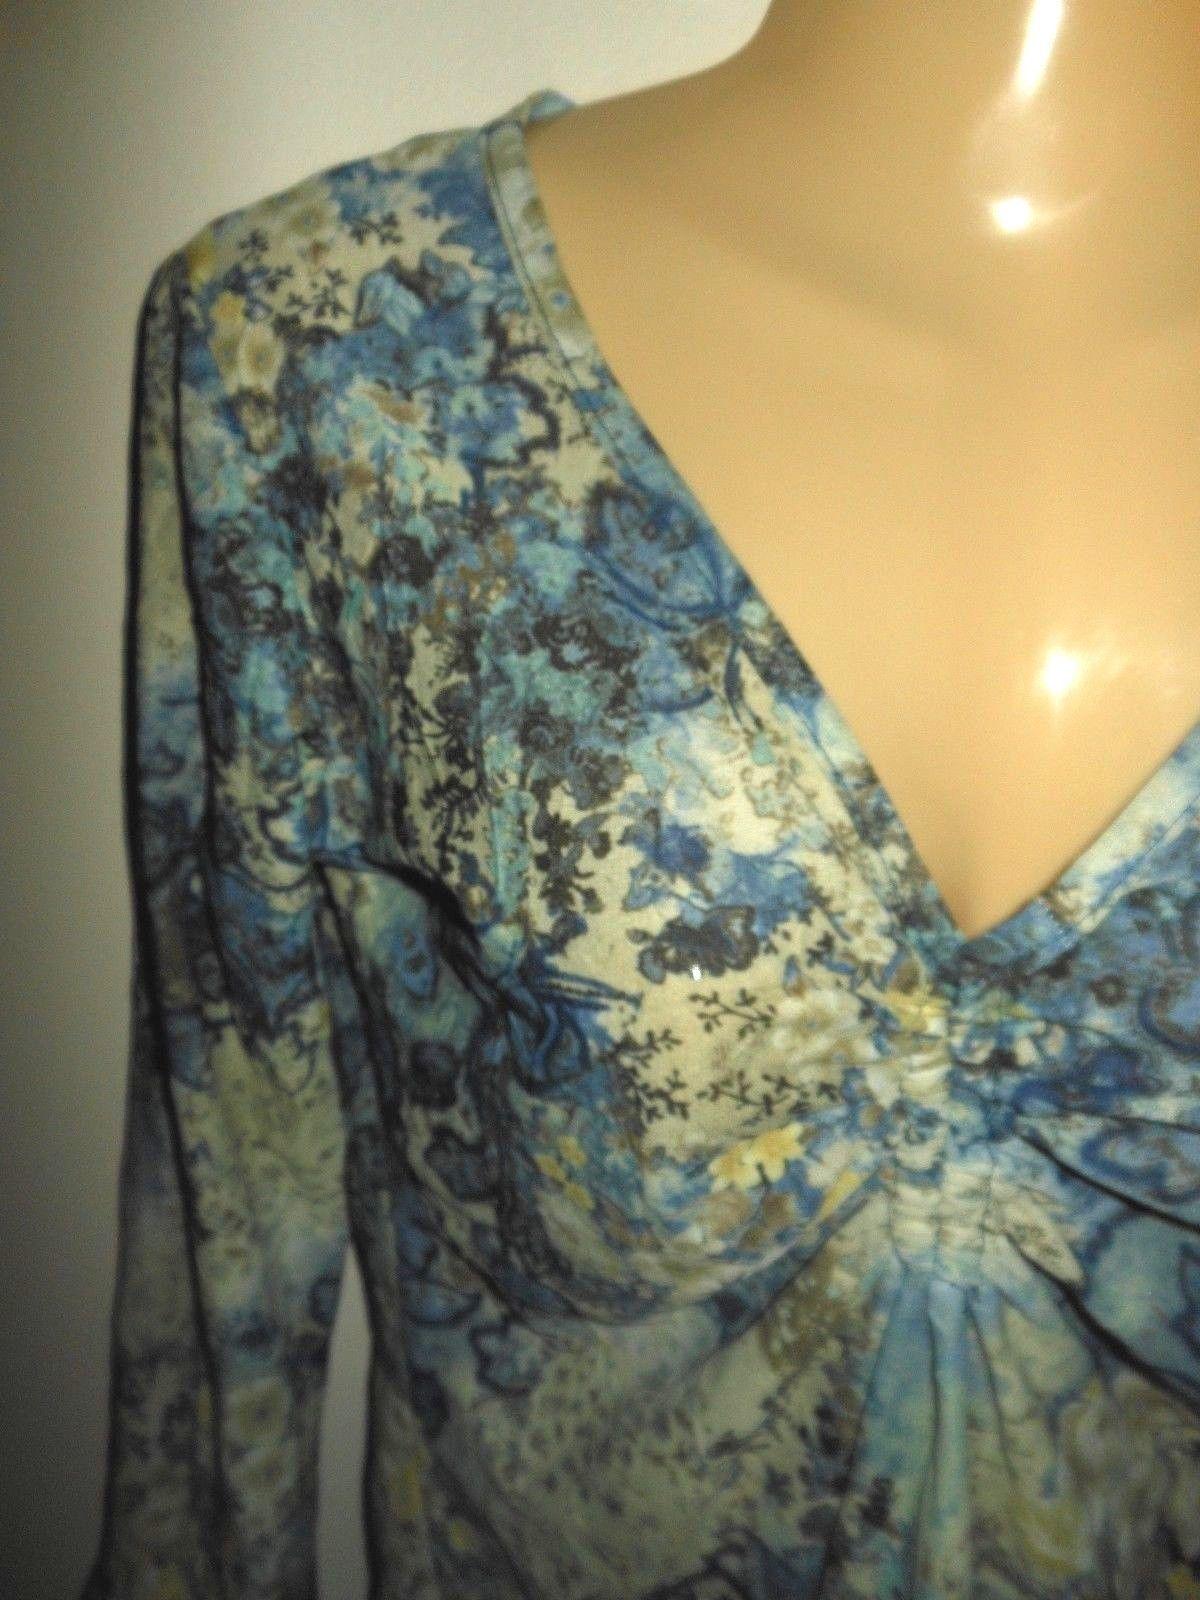 MARIA GABRIELLE ~ SMALL BLUE FLORAL PRINT POINTED HEM BELL CUFF BLOUSE TOP